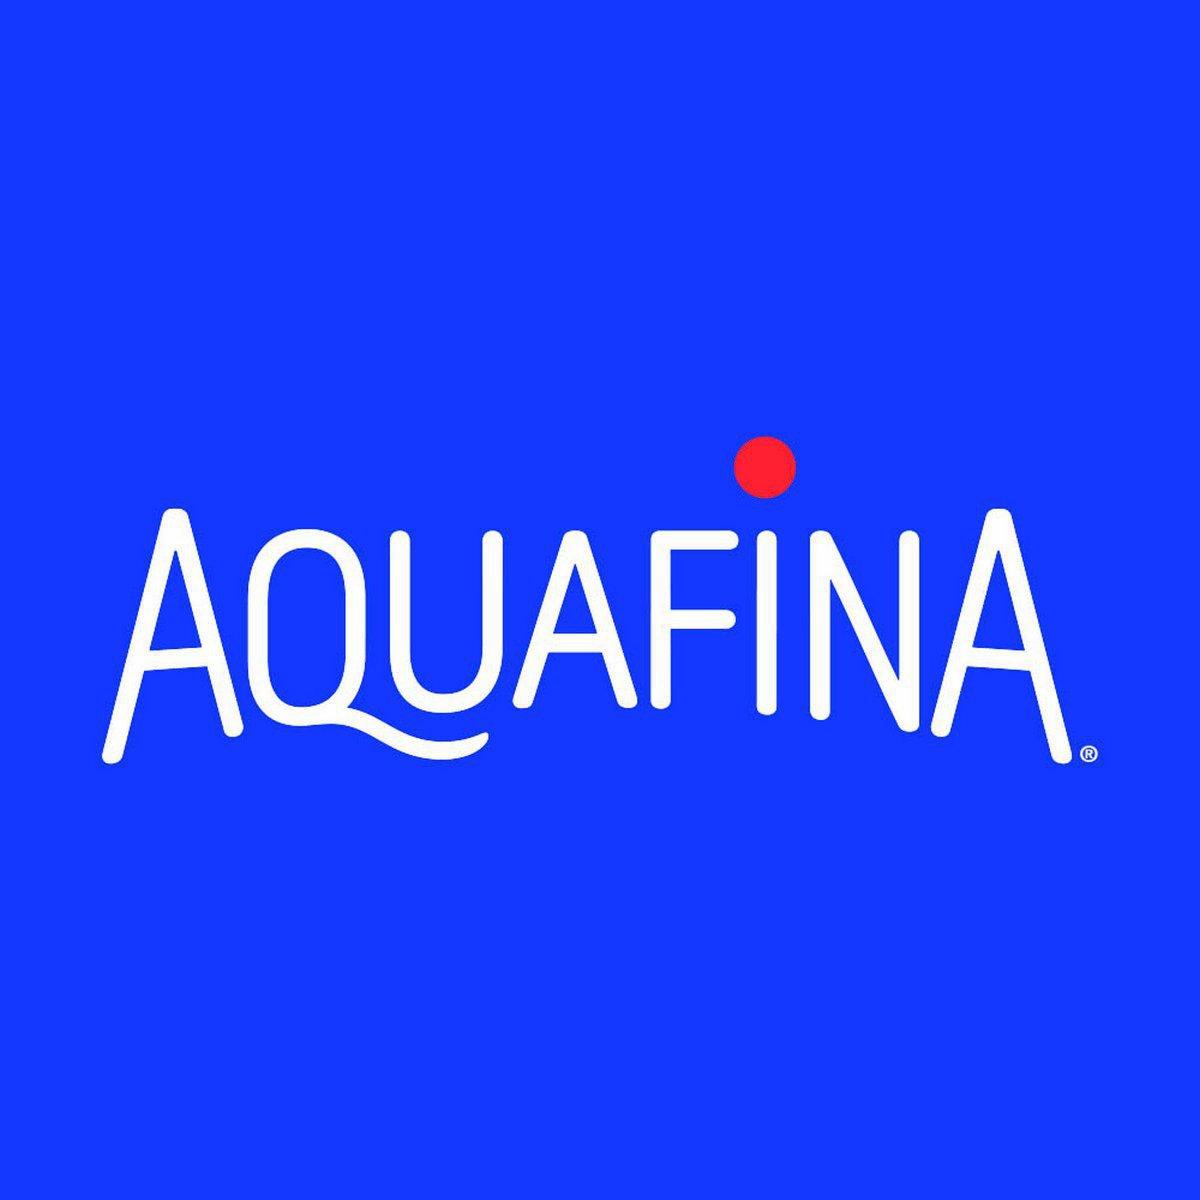 Marketing Strategy of Aquafina – Aquafina Marketing Strategy